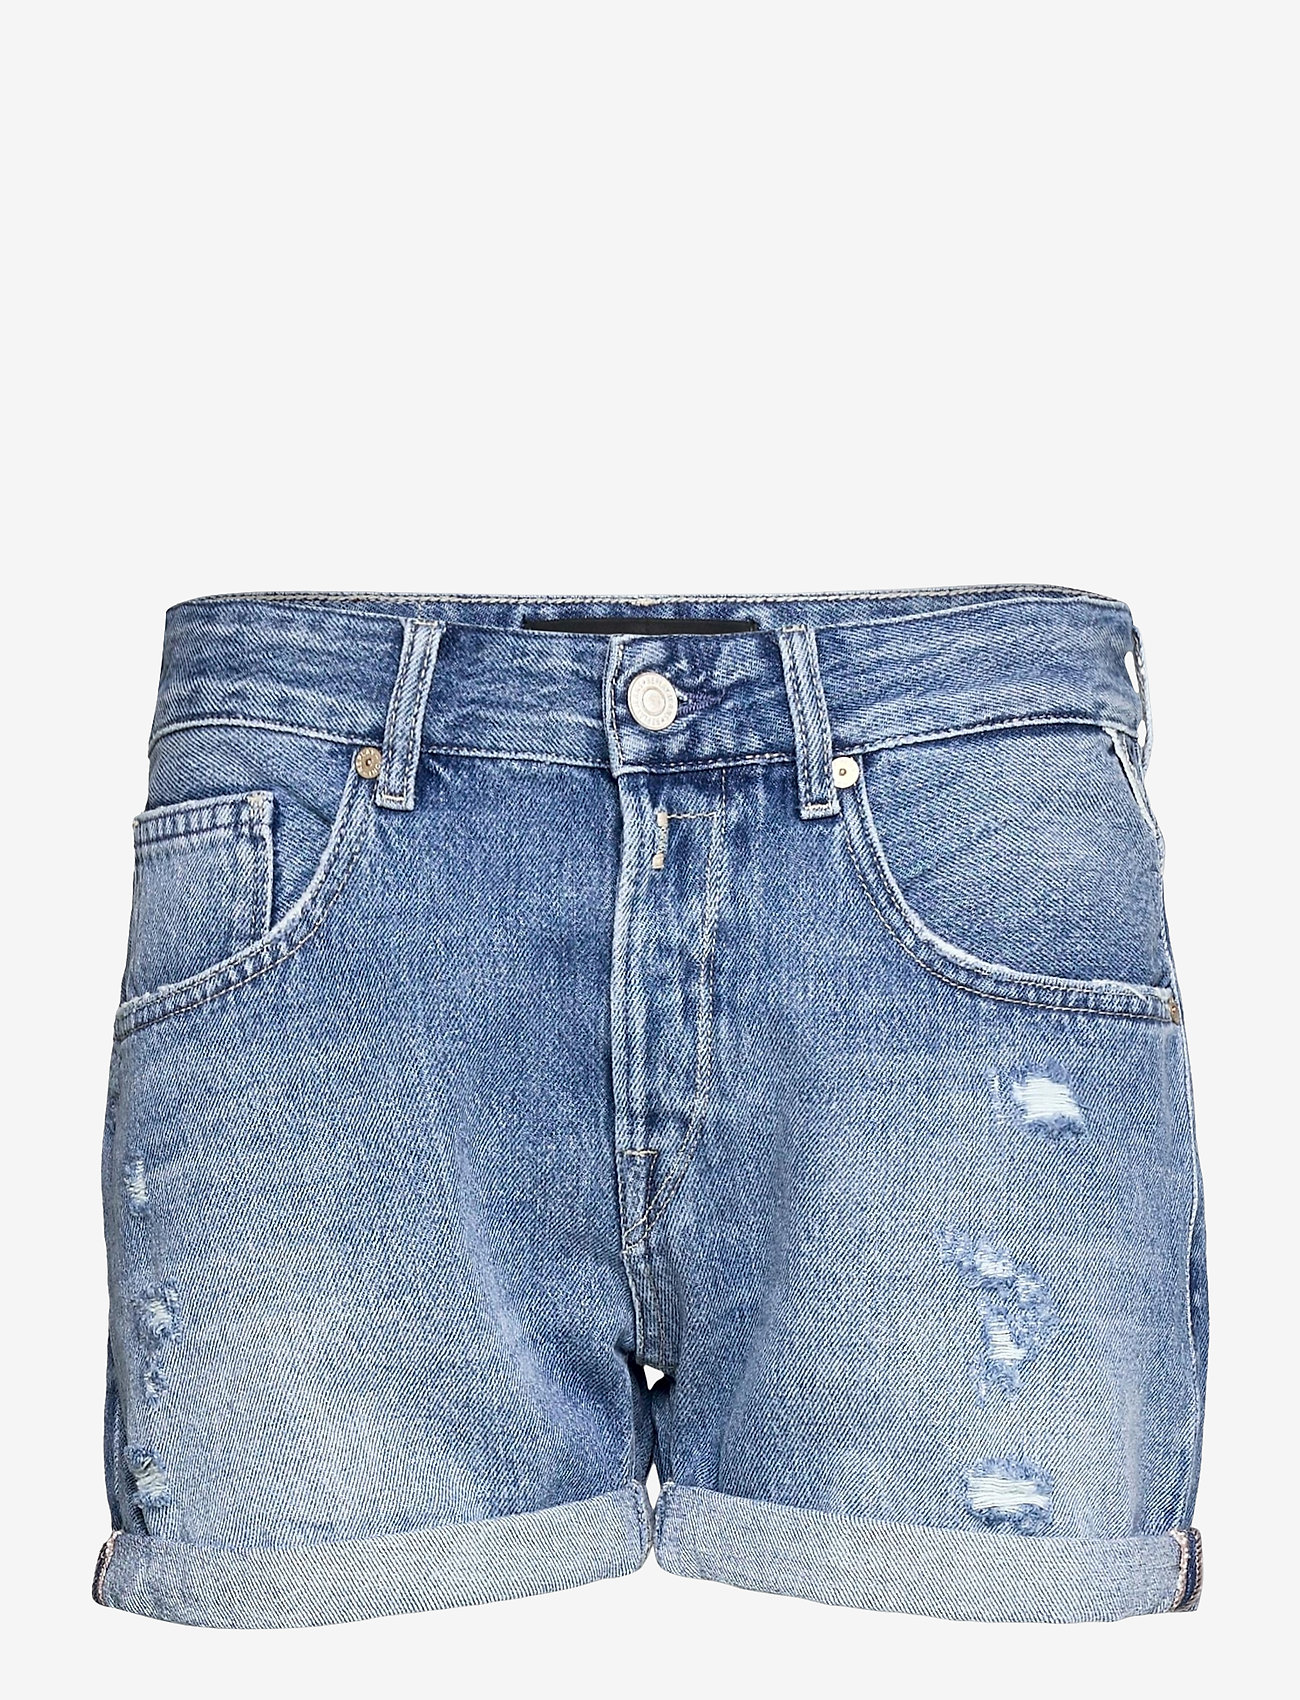 Replay - ANYTA Rose Label Pack - jeansshorts - medium blue - 0